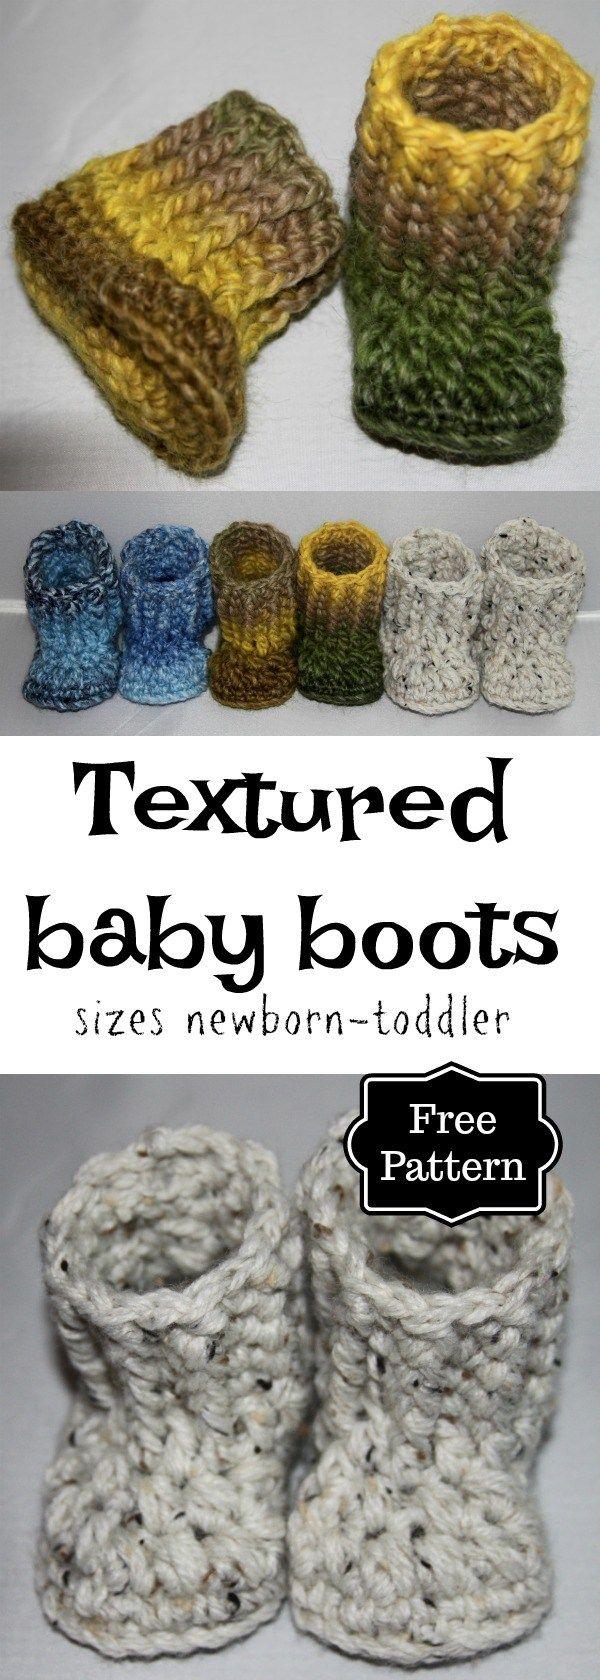 Crochet textured baby-toddler boots - #crochetbabyboots